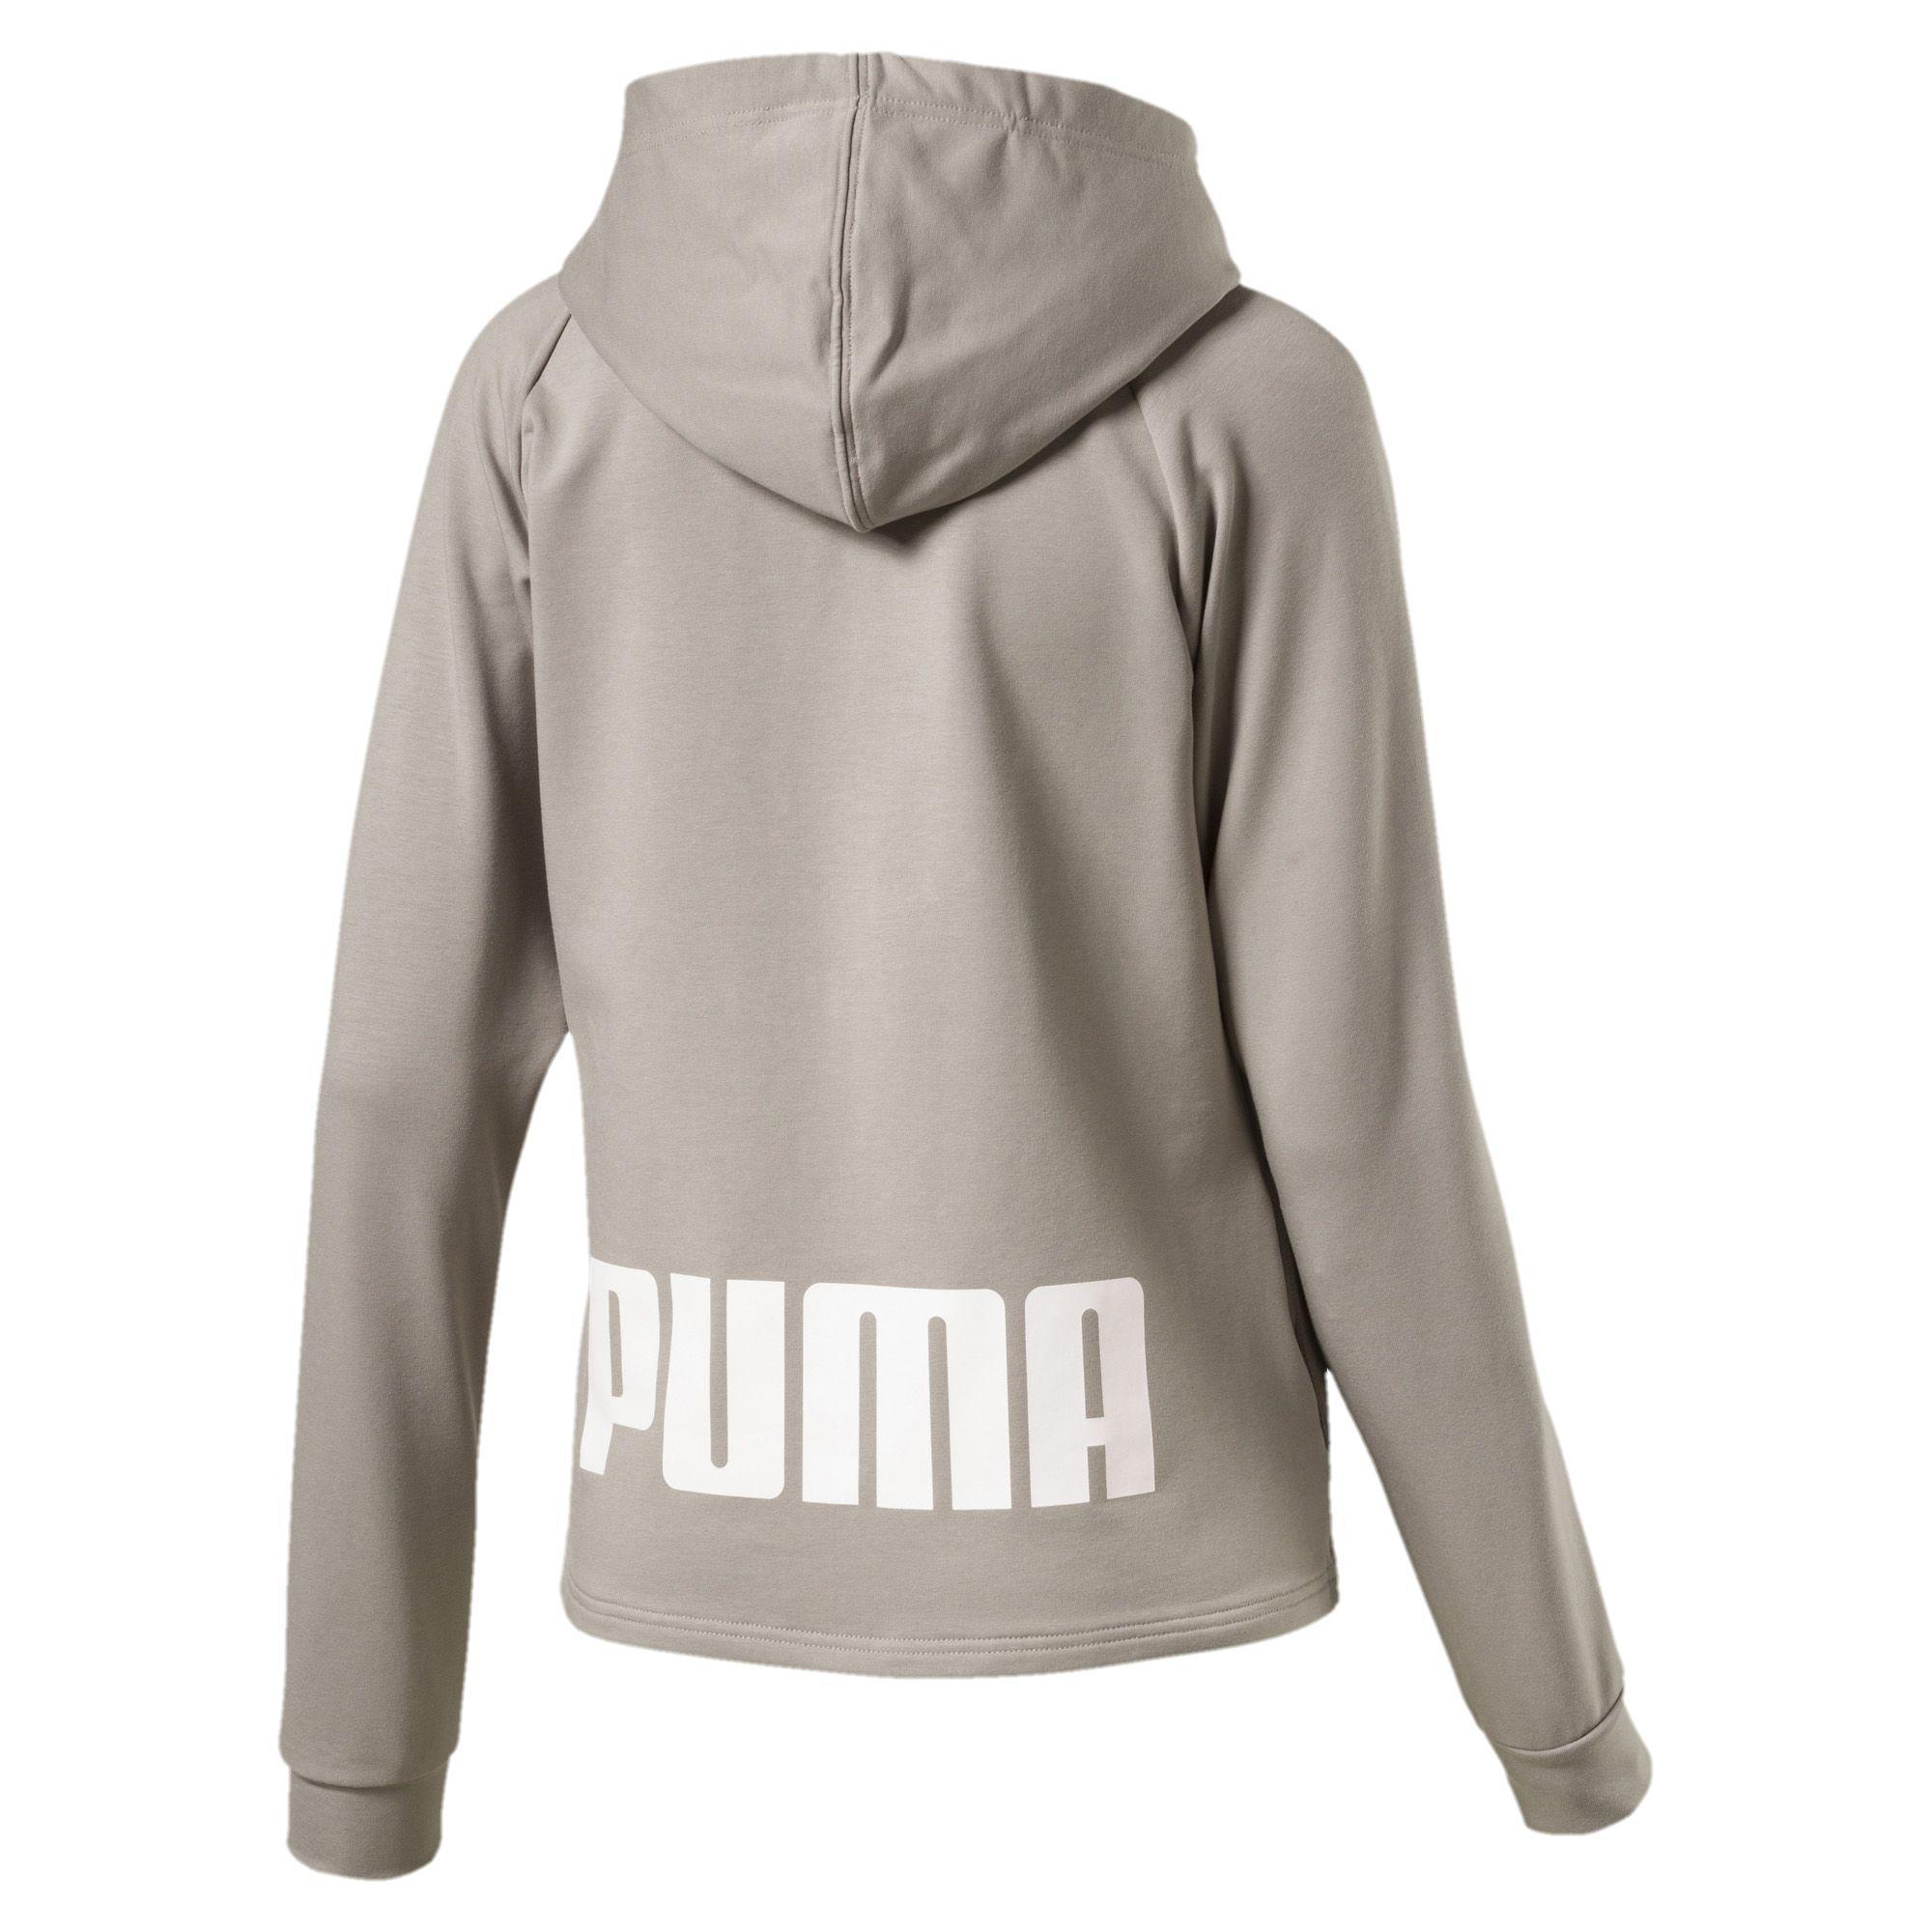 878358c75345 Lyst - PUMA Training Urban Sports Women s Full Zip Hoodie in Gray